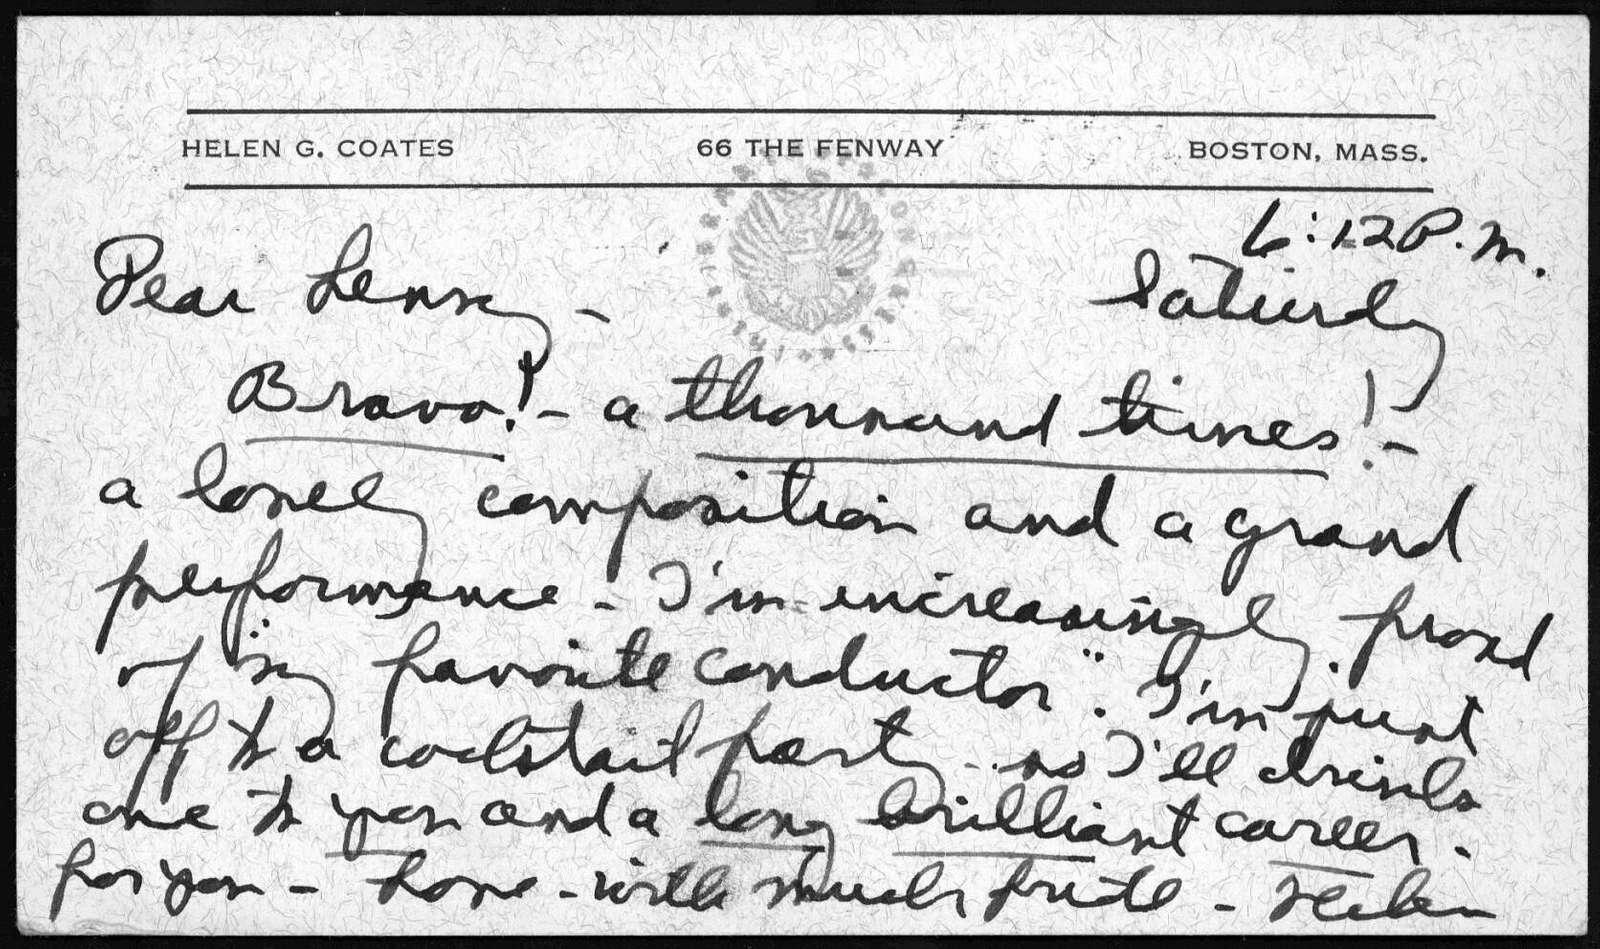 Letter from Helen Coates to Leonard Bernstein, n.d